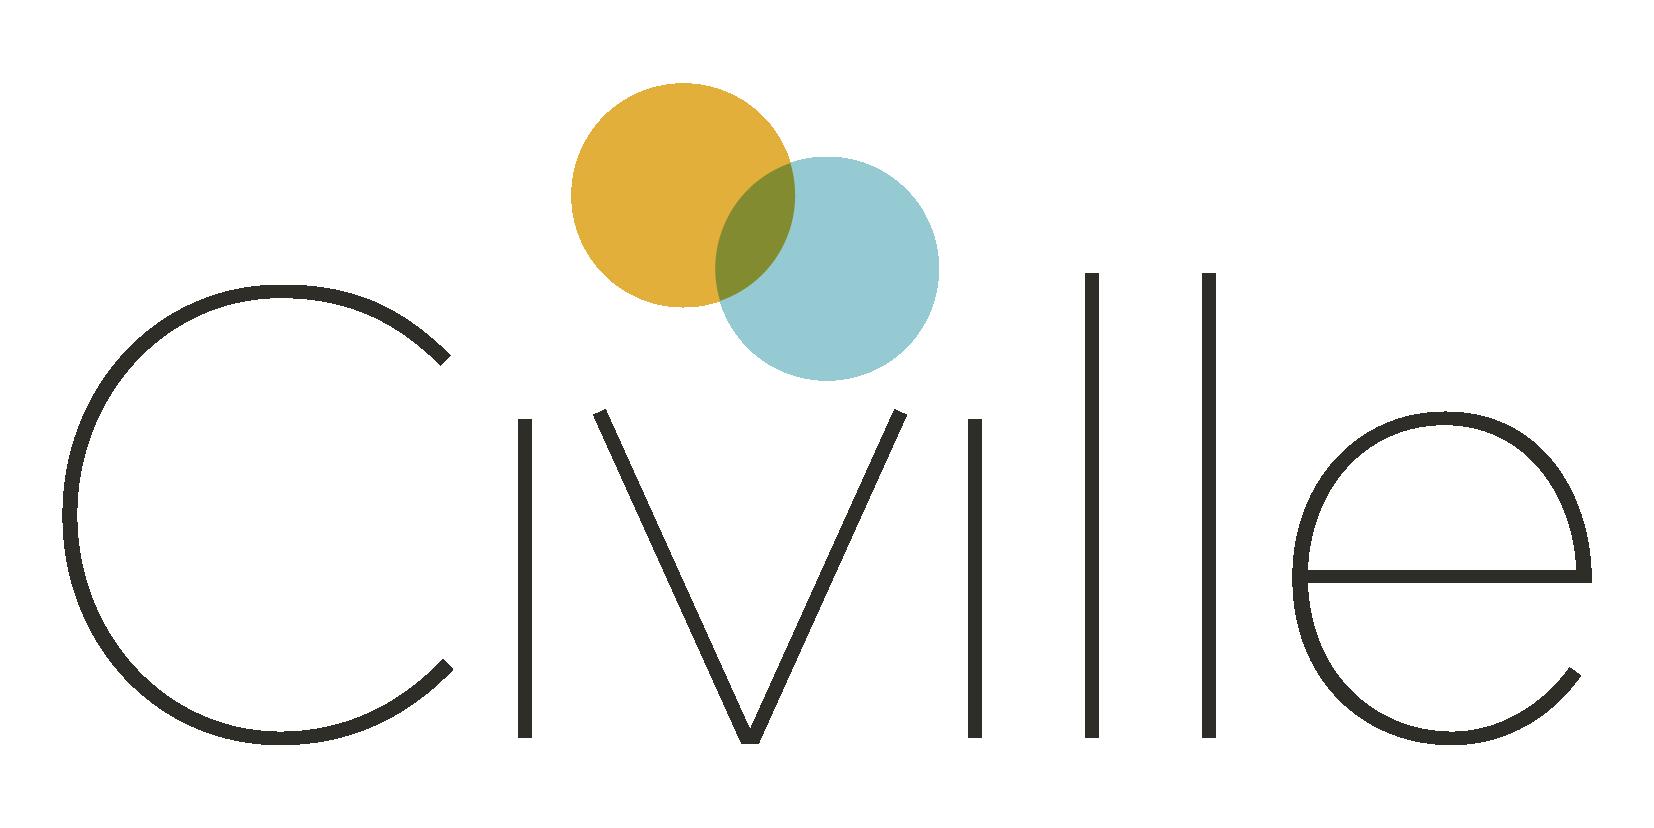 Civille